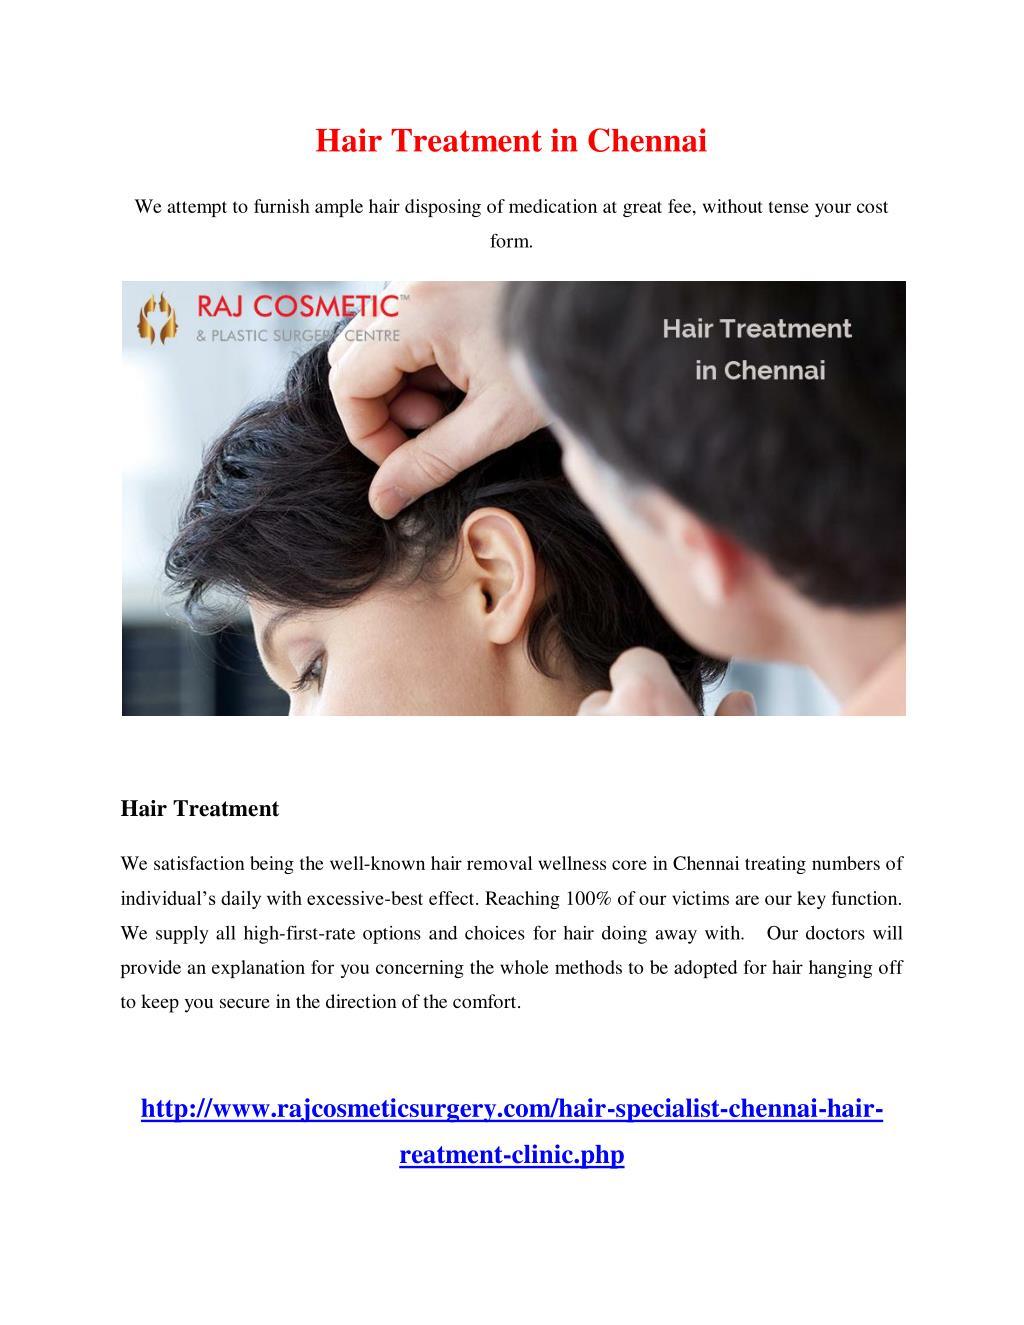 Ppt Hair Treatment In Chennai Powerpoint Presentation Free